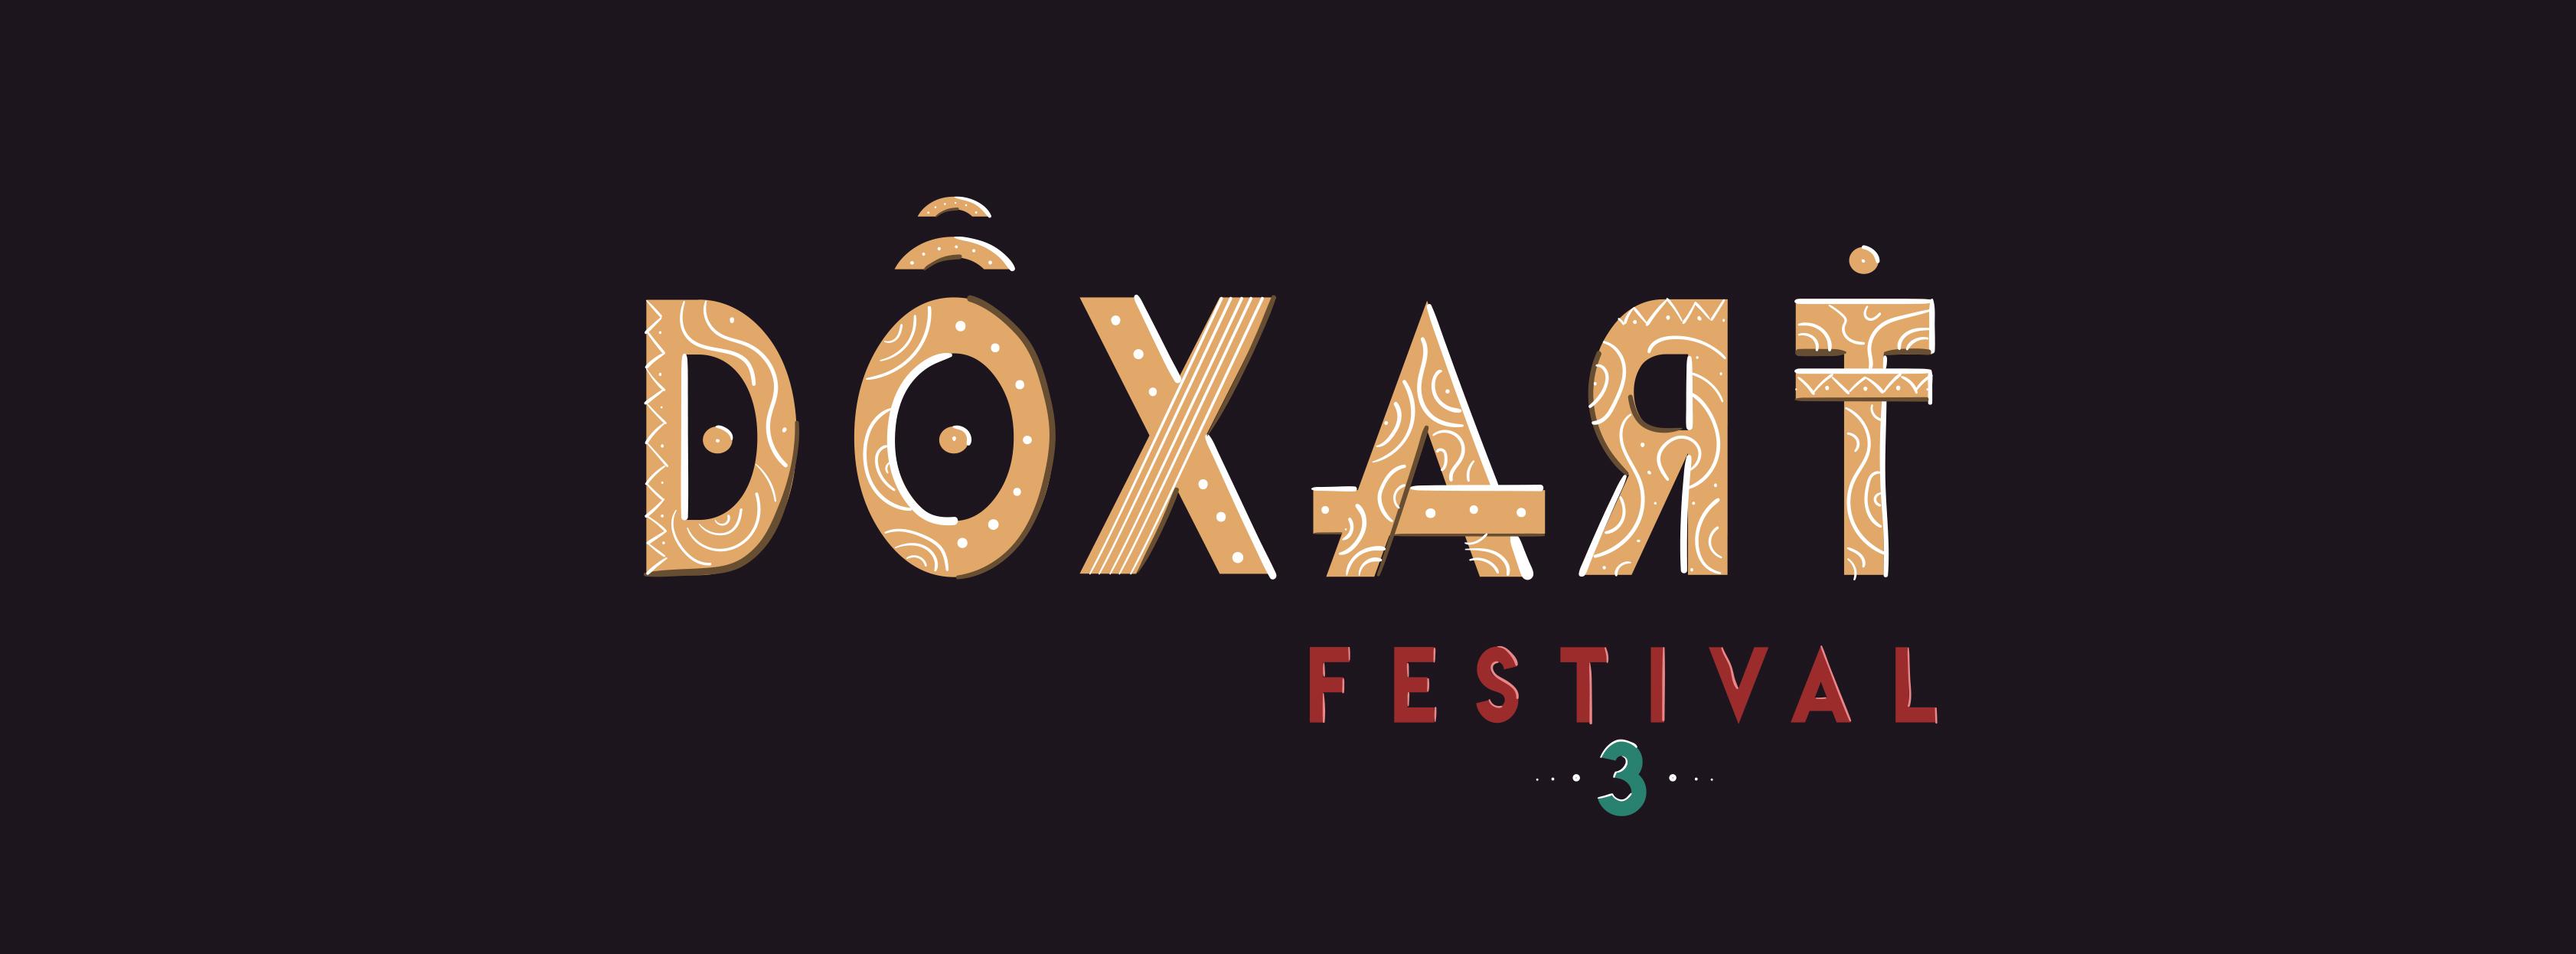 Dox'Art Festival 2019 - 28, 29 & 30 juin